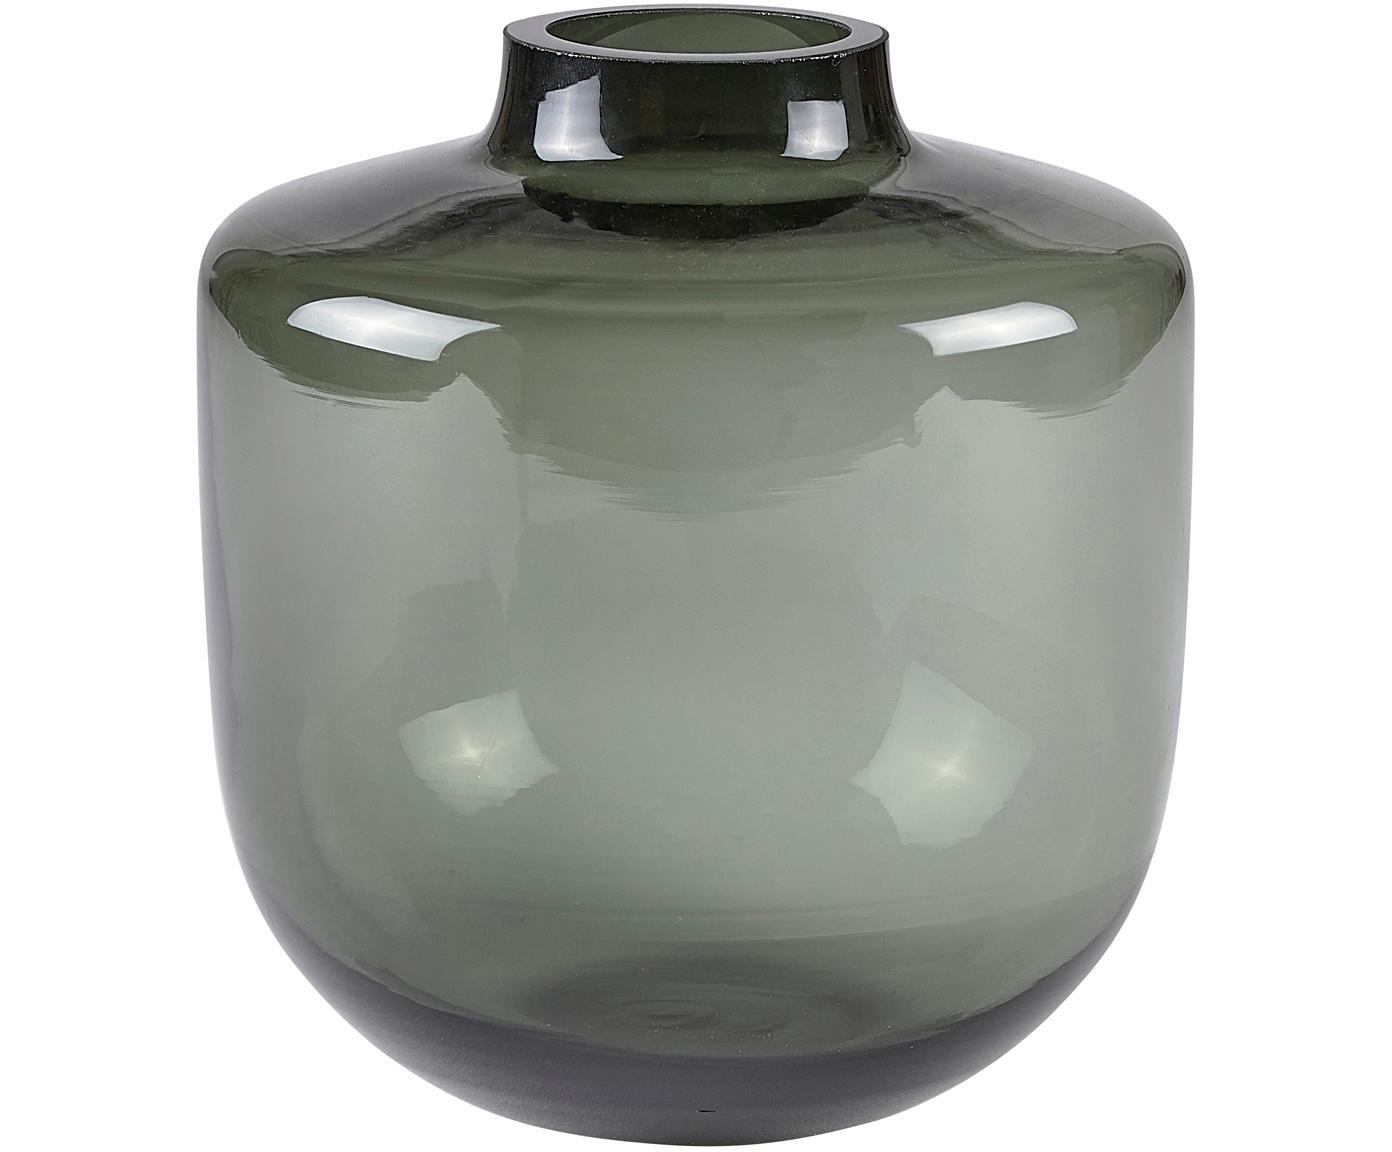 Vase Ragu, Glas, Grau, transparent, Ø 15 x H 16 cm